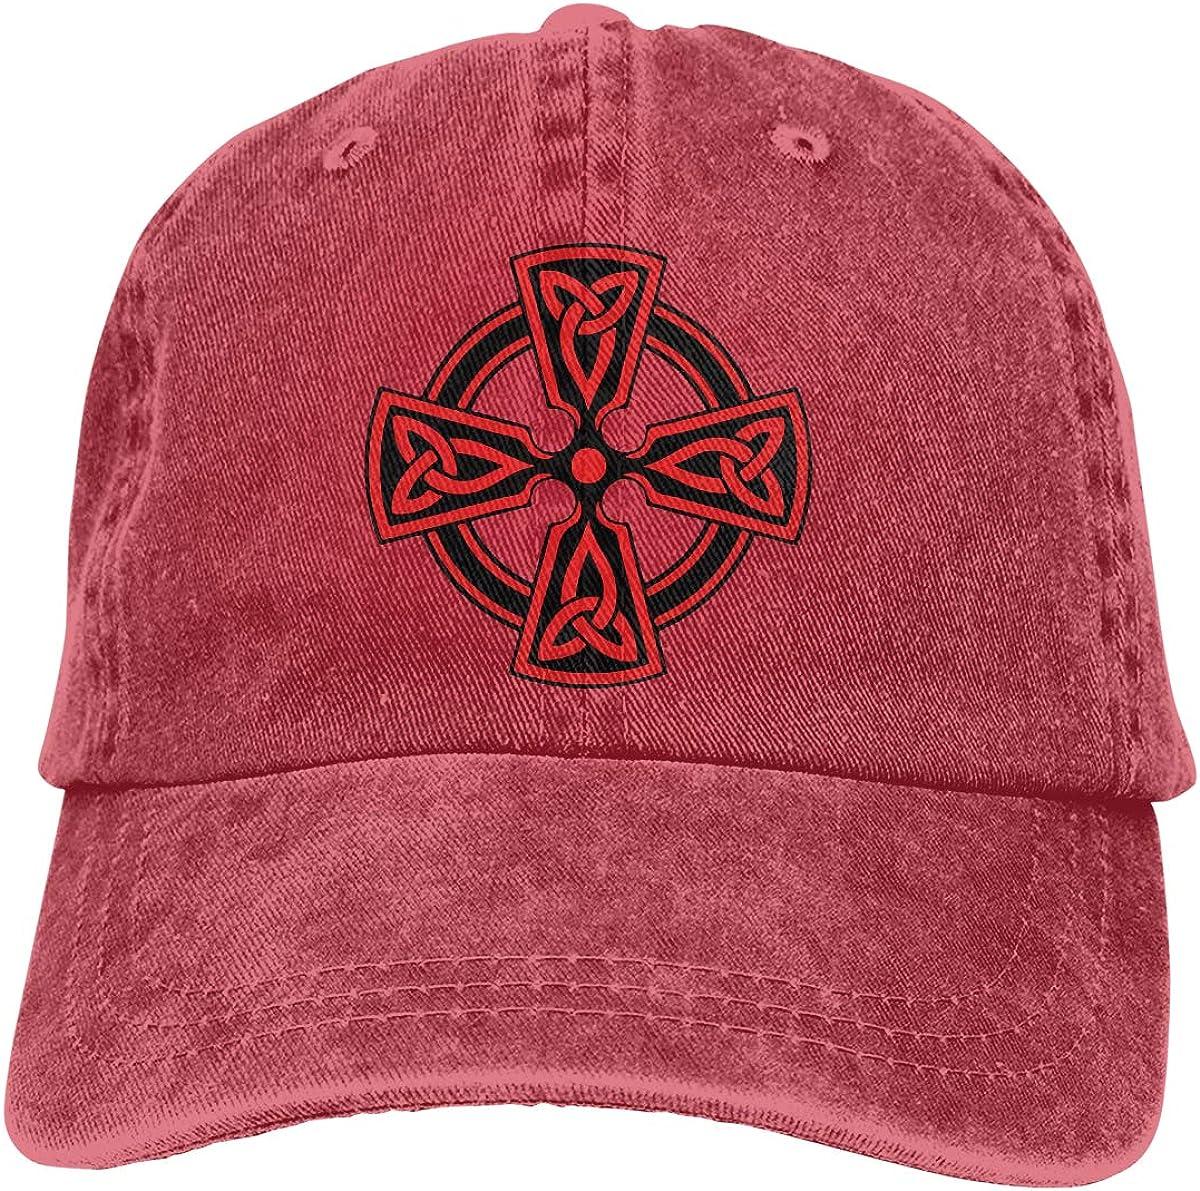 Red Celtic Unisex Trendy Cowboy Hat Casquette Adjustable Baseball Cap